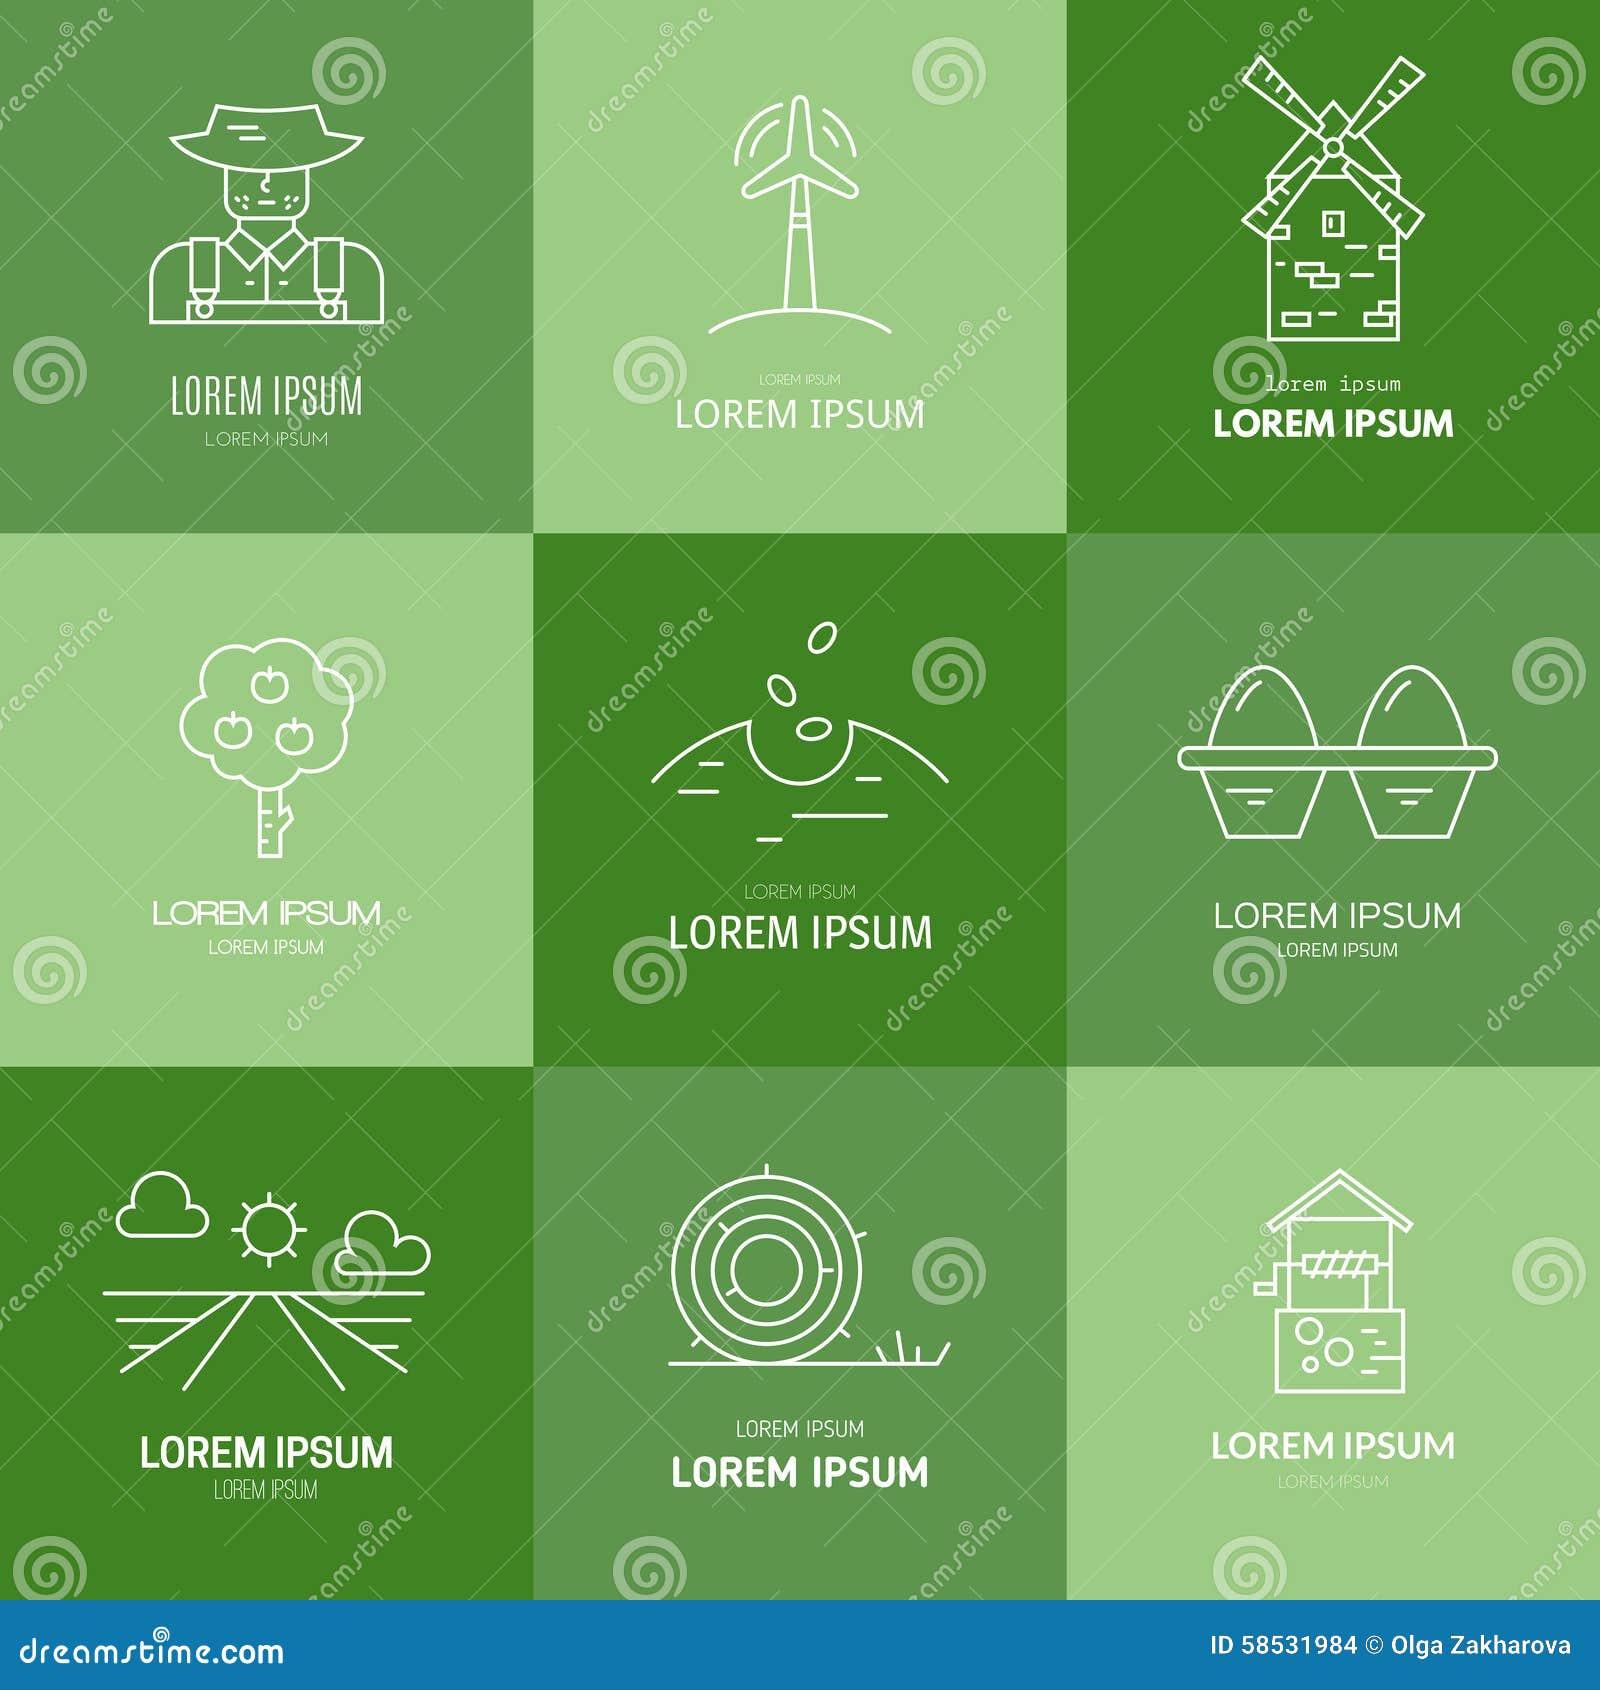 Organic Farming Logo Stock Vector. Illustration Of Logo